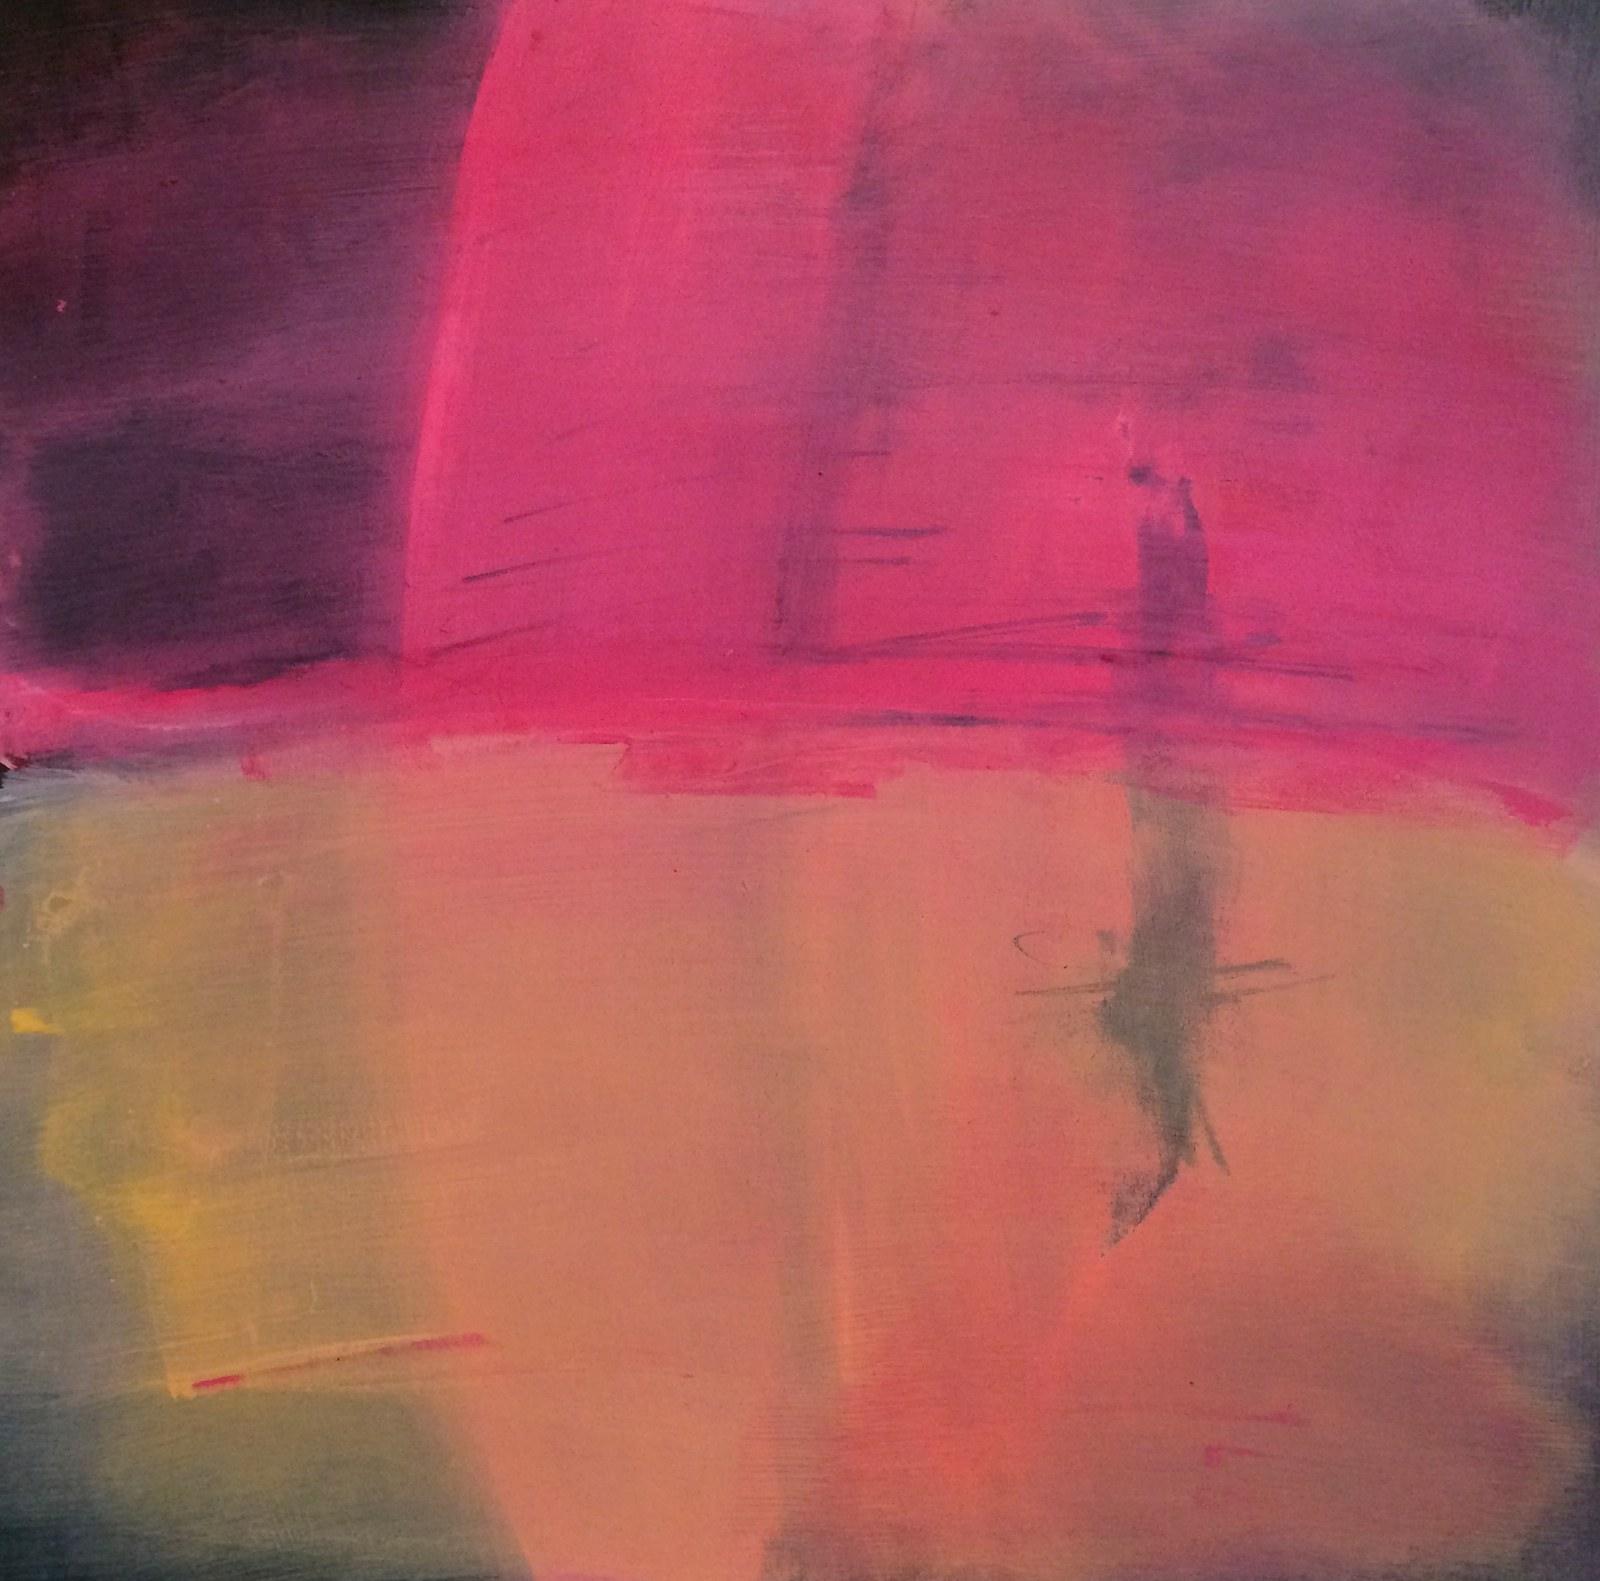 how time feels (honey-covered), 40 x 40 cm, 2015, Jane Hughes